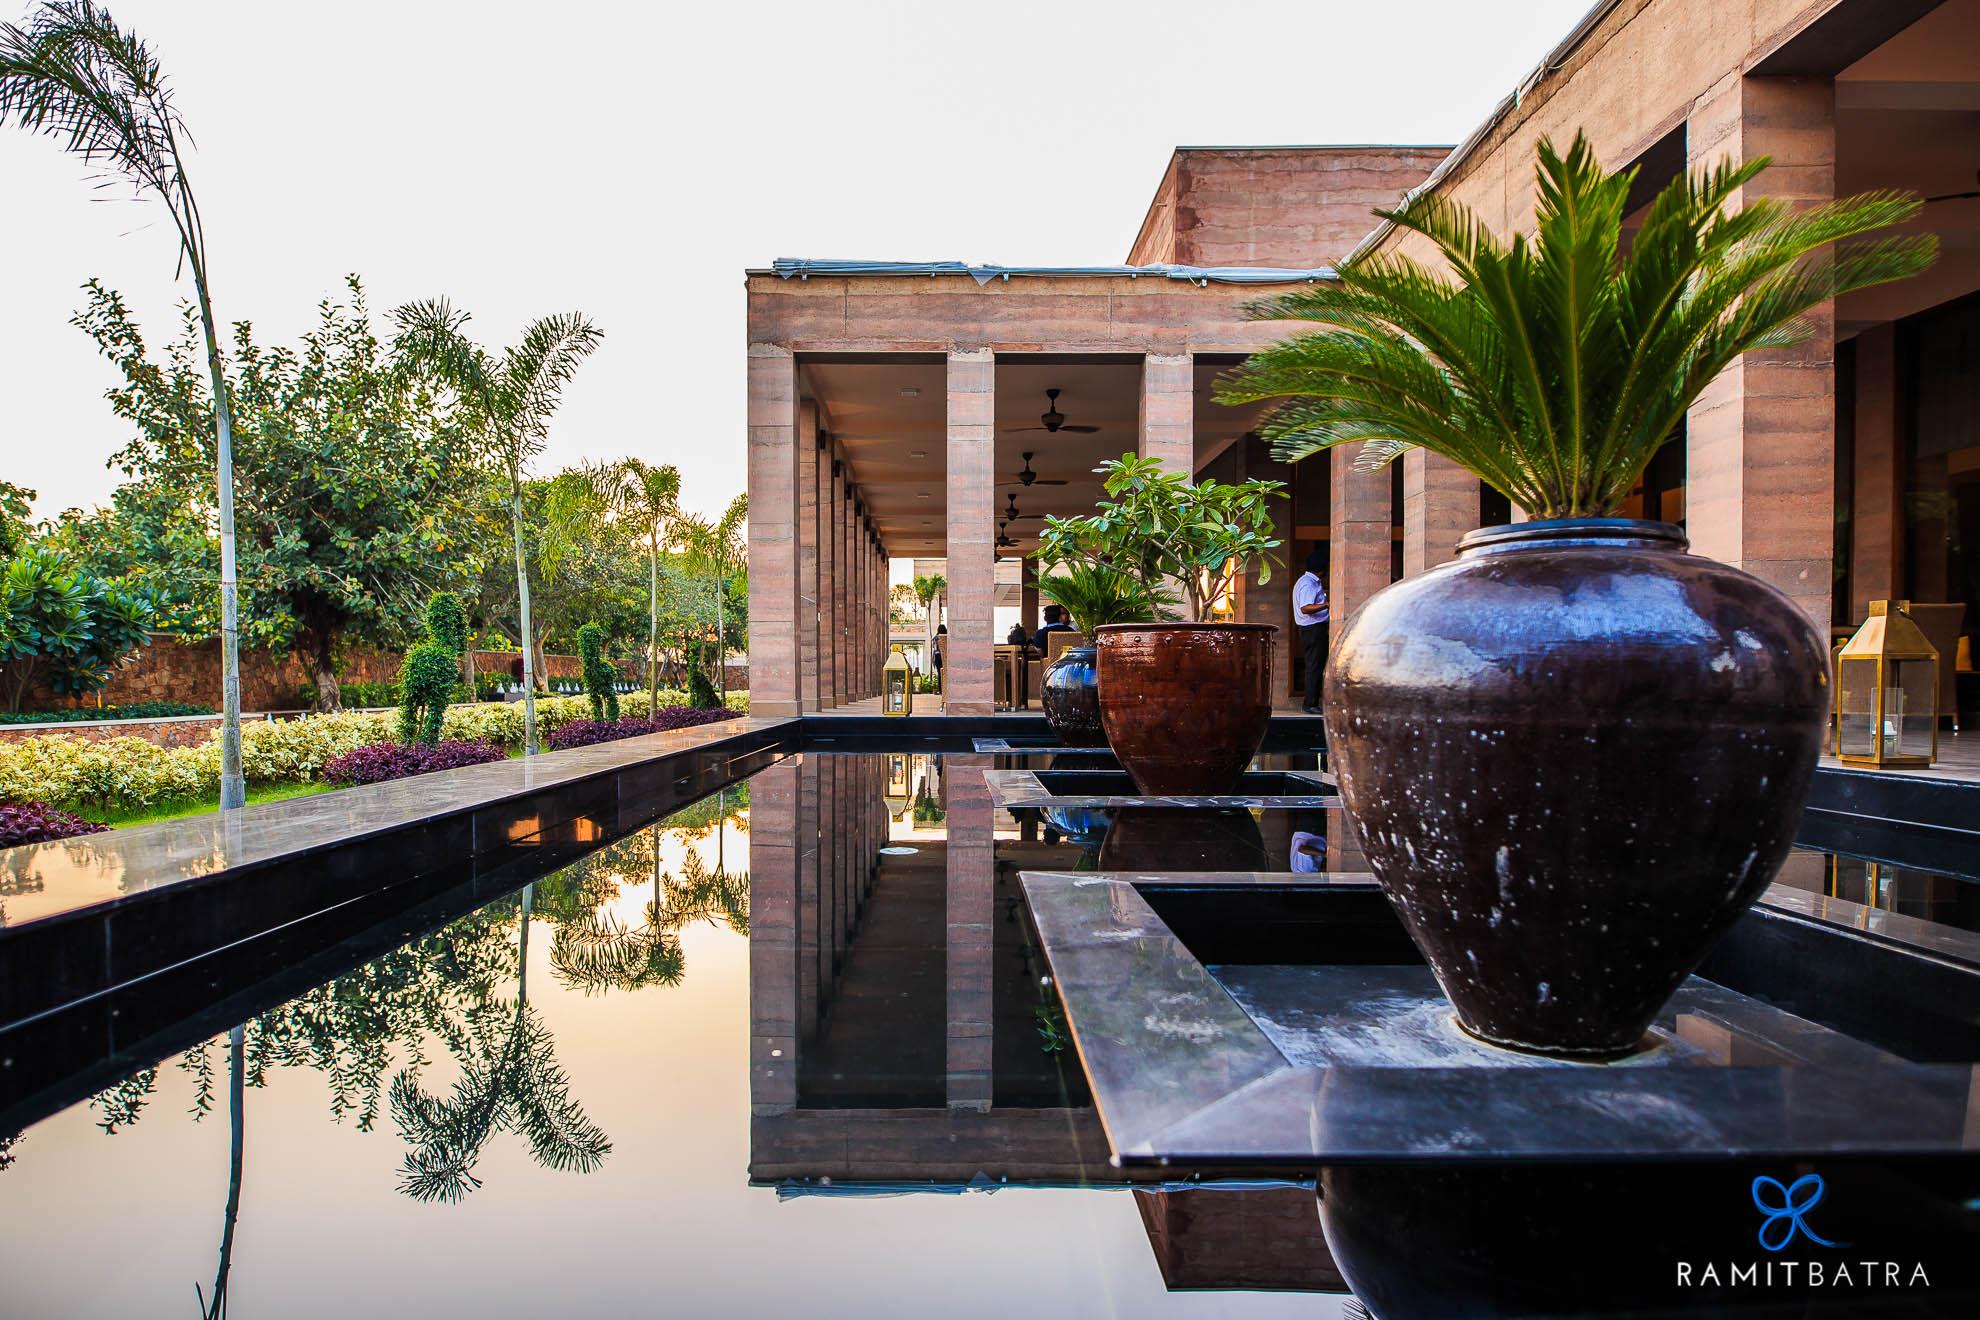 lalit-mangar-hotel-near-delhi-ramitbatra-025